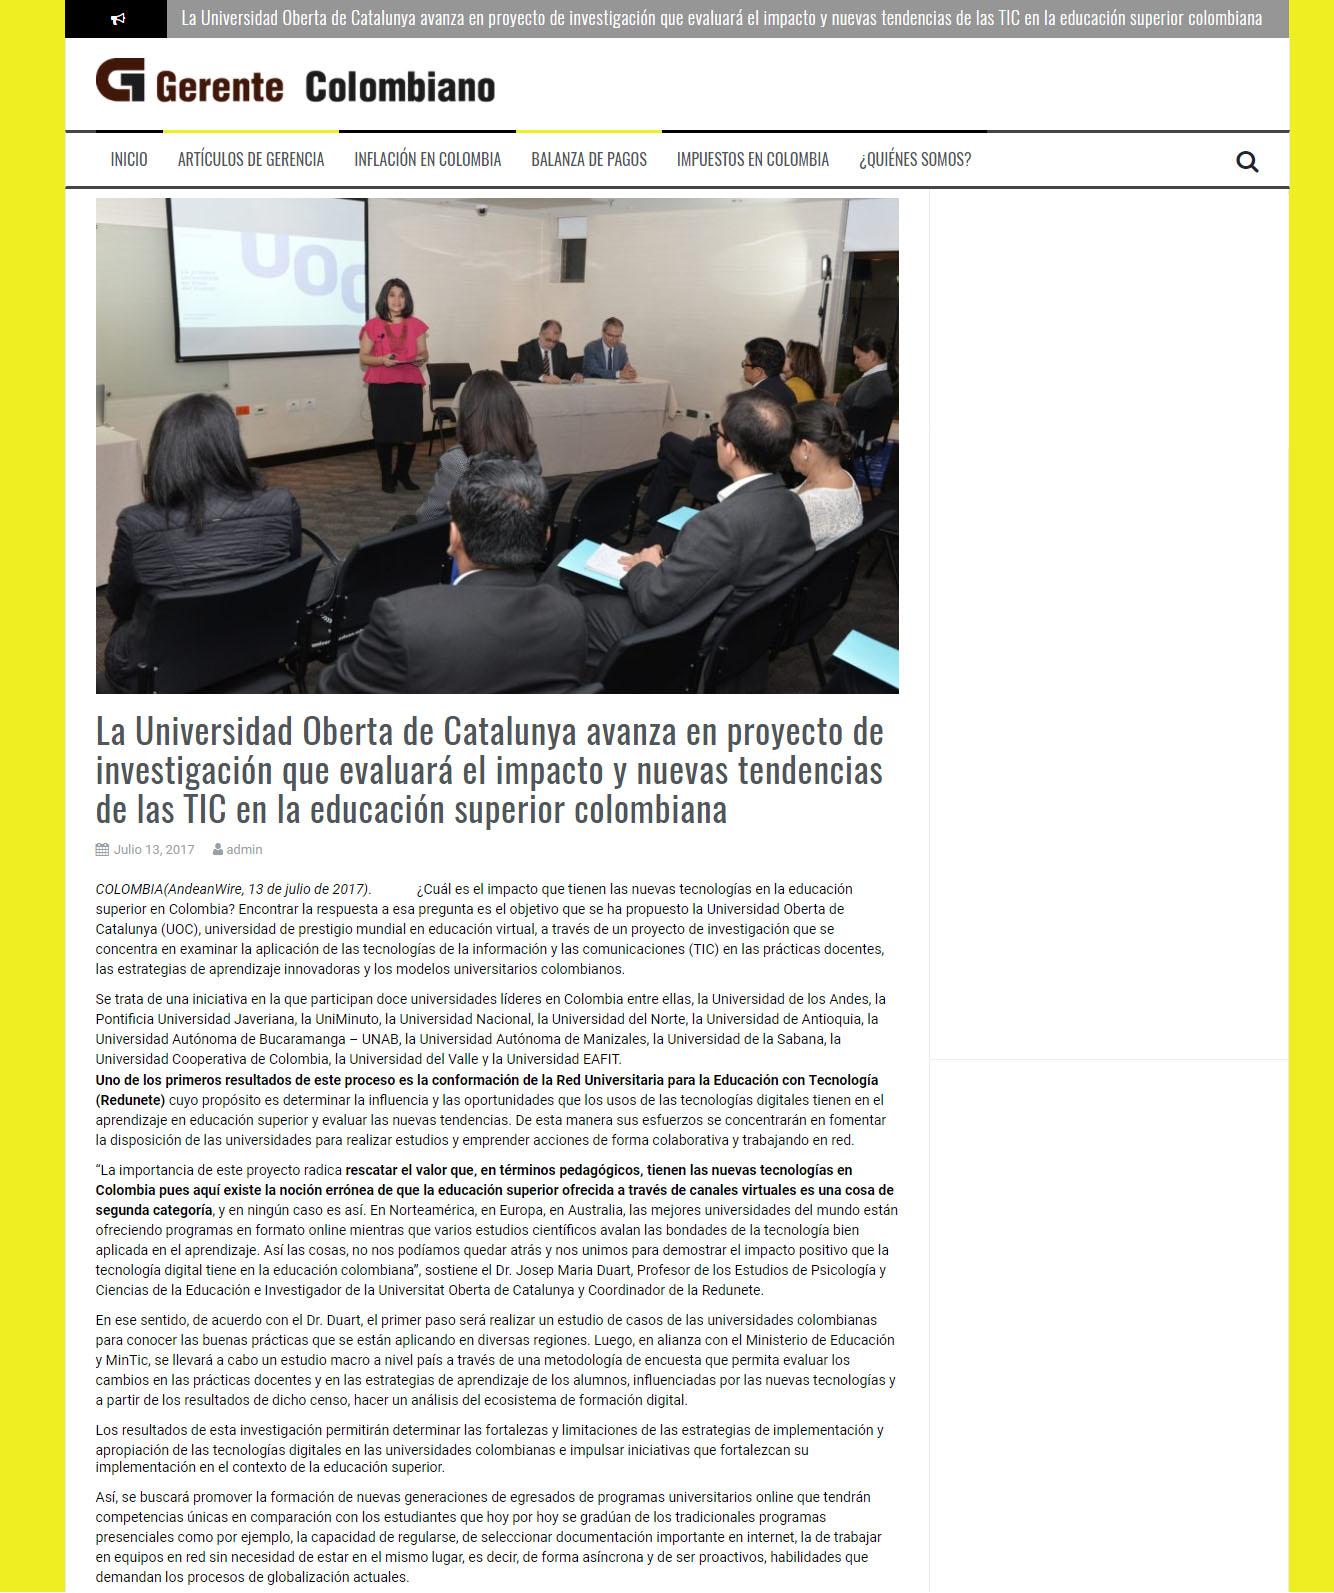 www.gerentecolombiano.com.co 14 de julio 2017